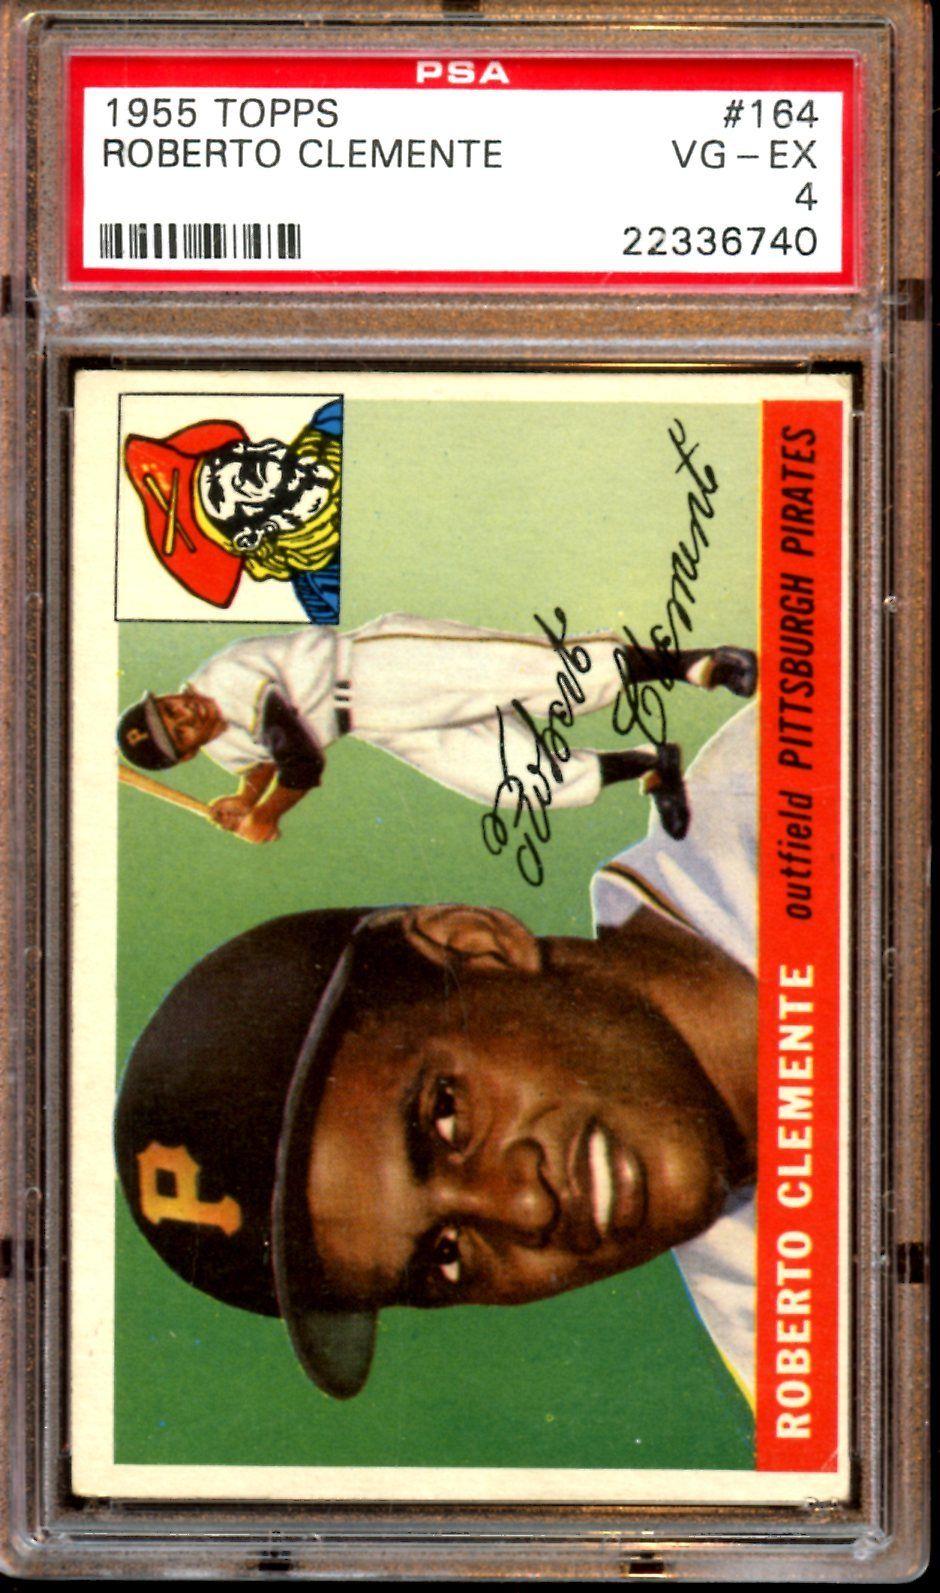 1955 Topps Baseball Card 164 Roberto Clemente Rookie PSA 4 VGEX